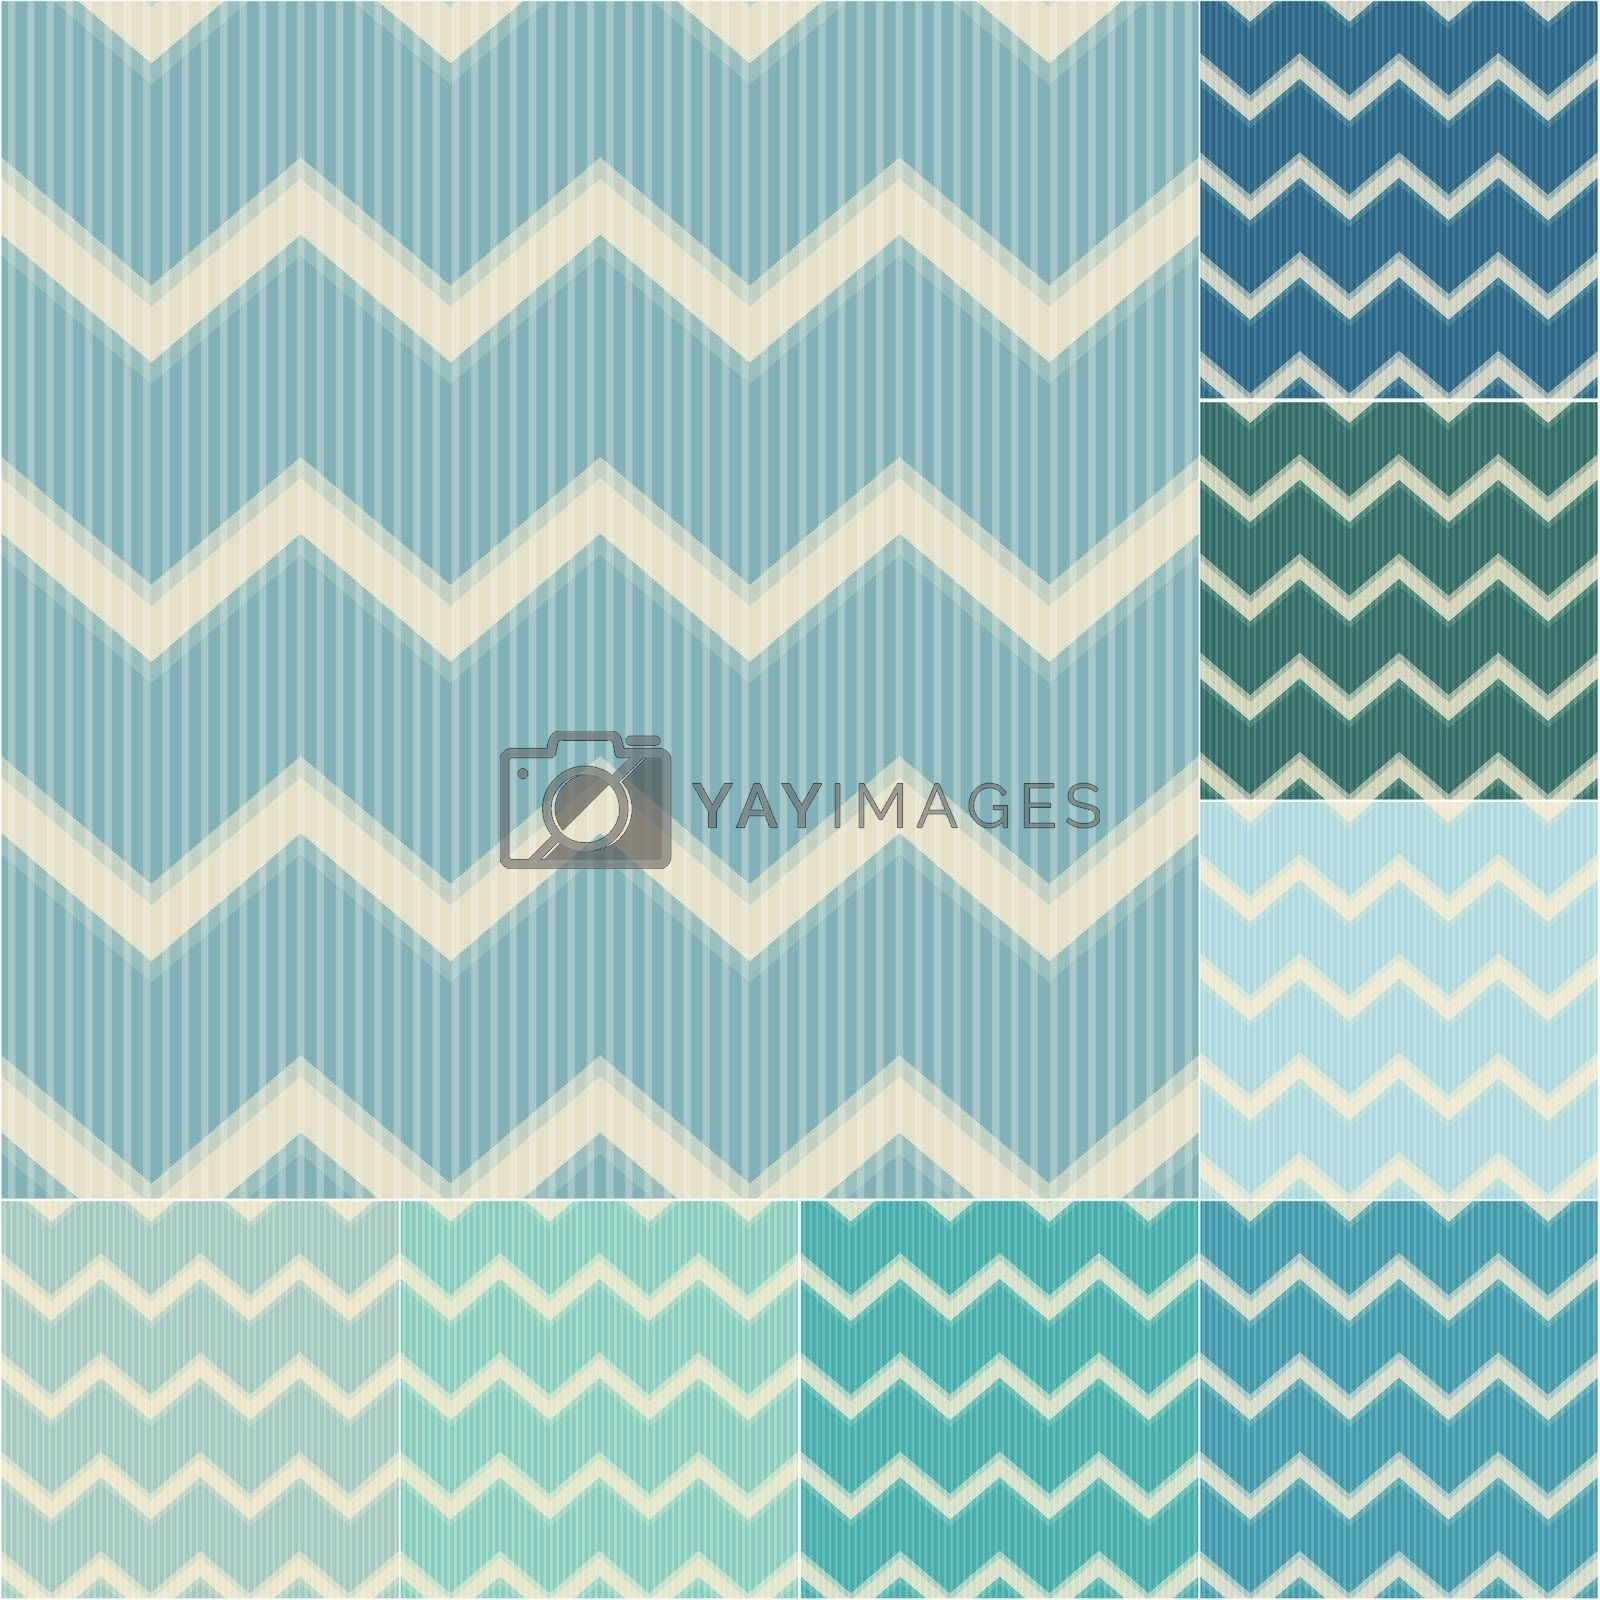 seamless green and blue chevron pattern set